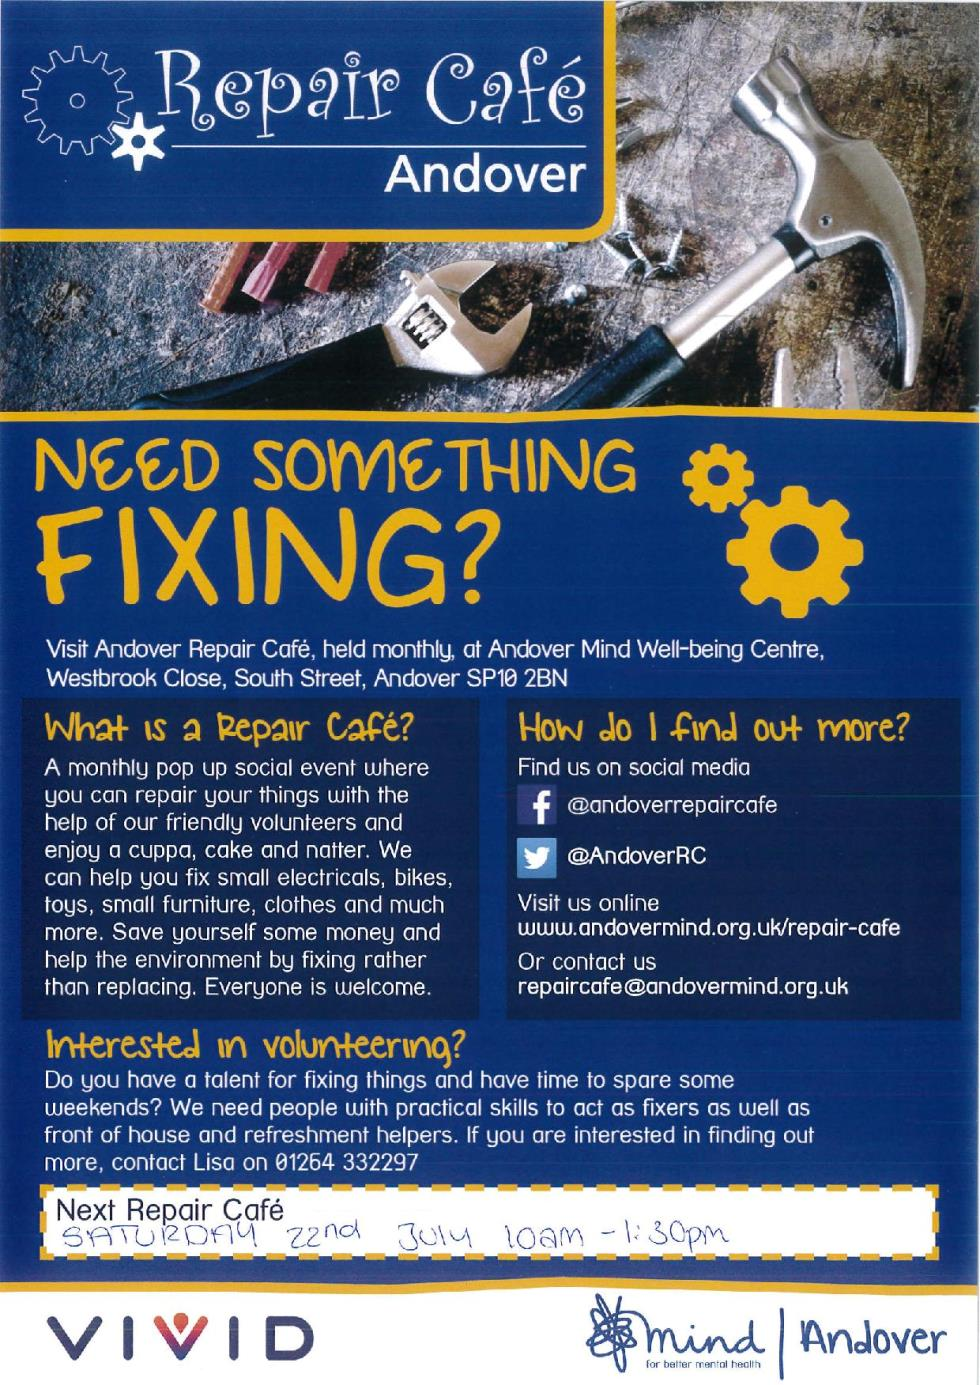 Andover Repair Cafe Poster